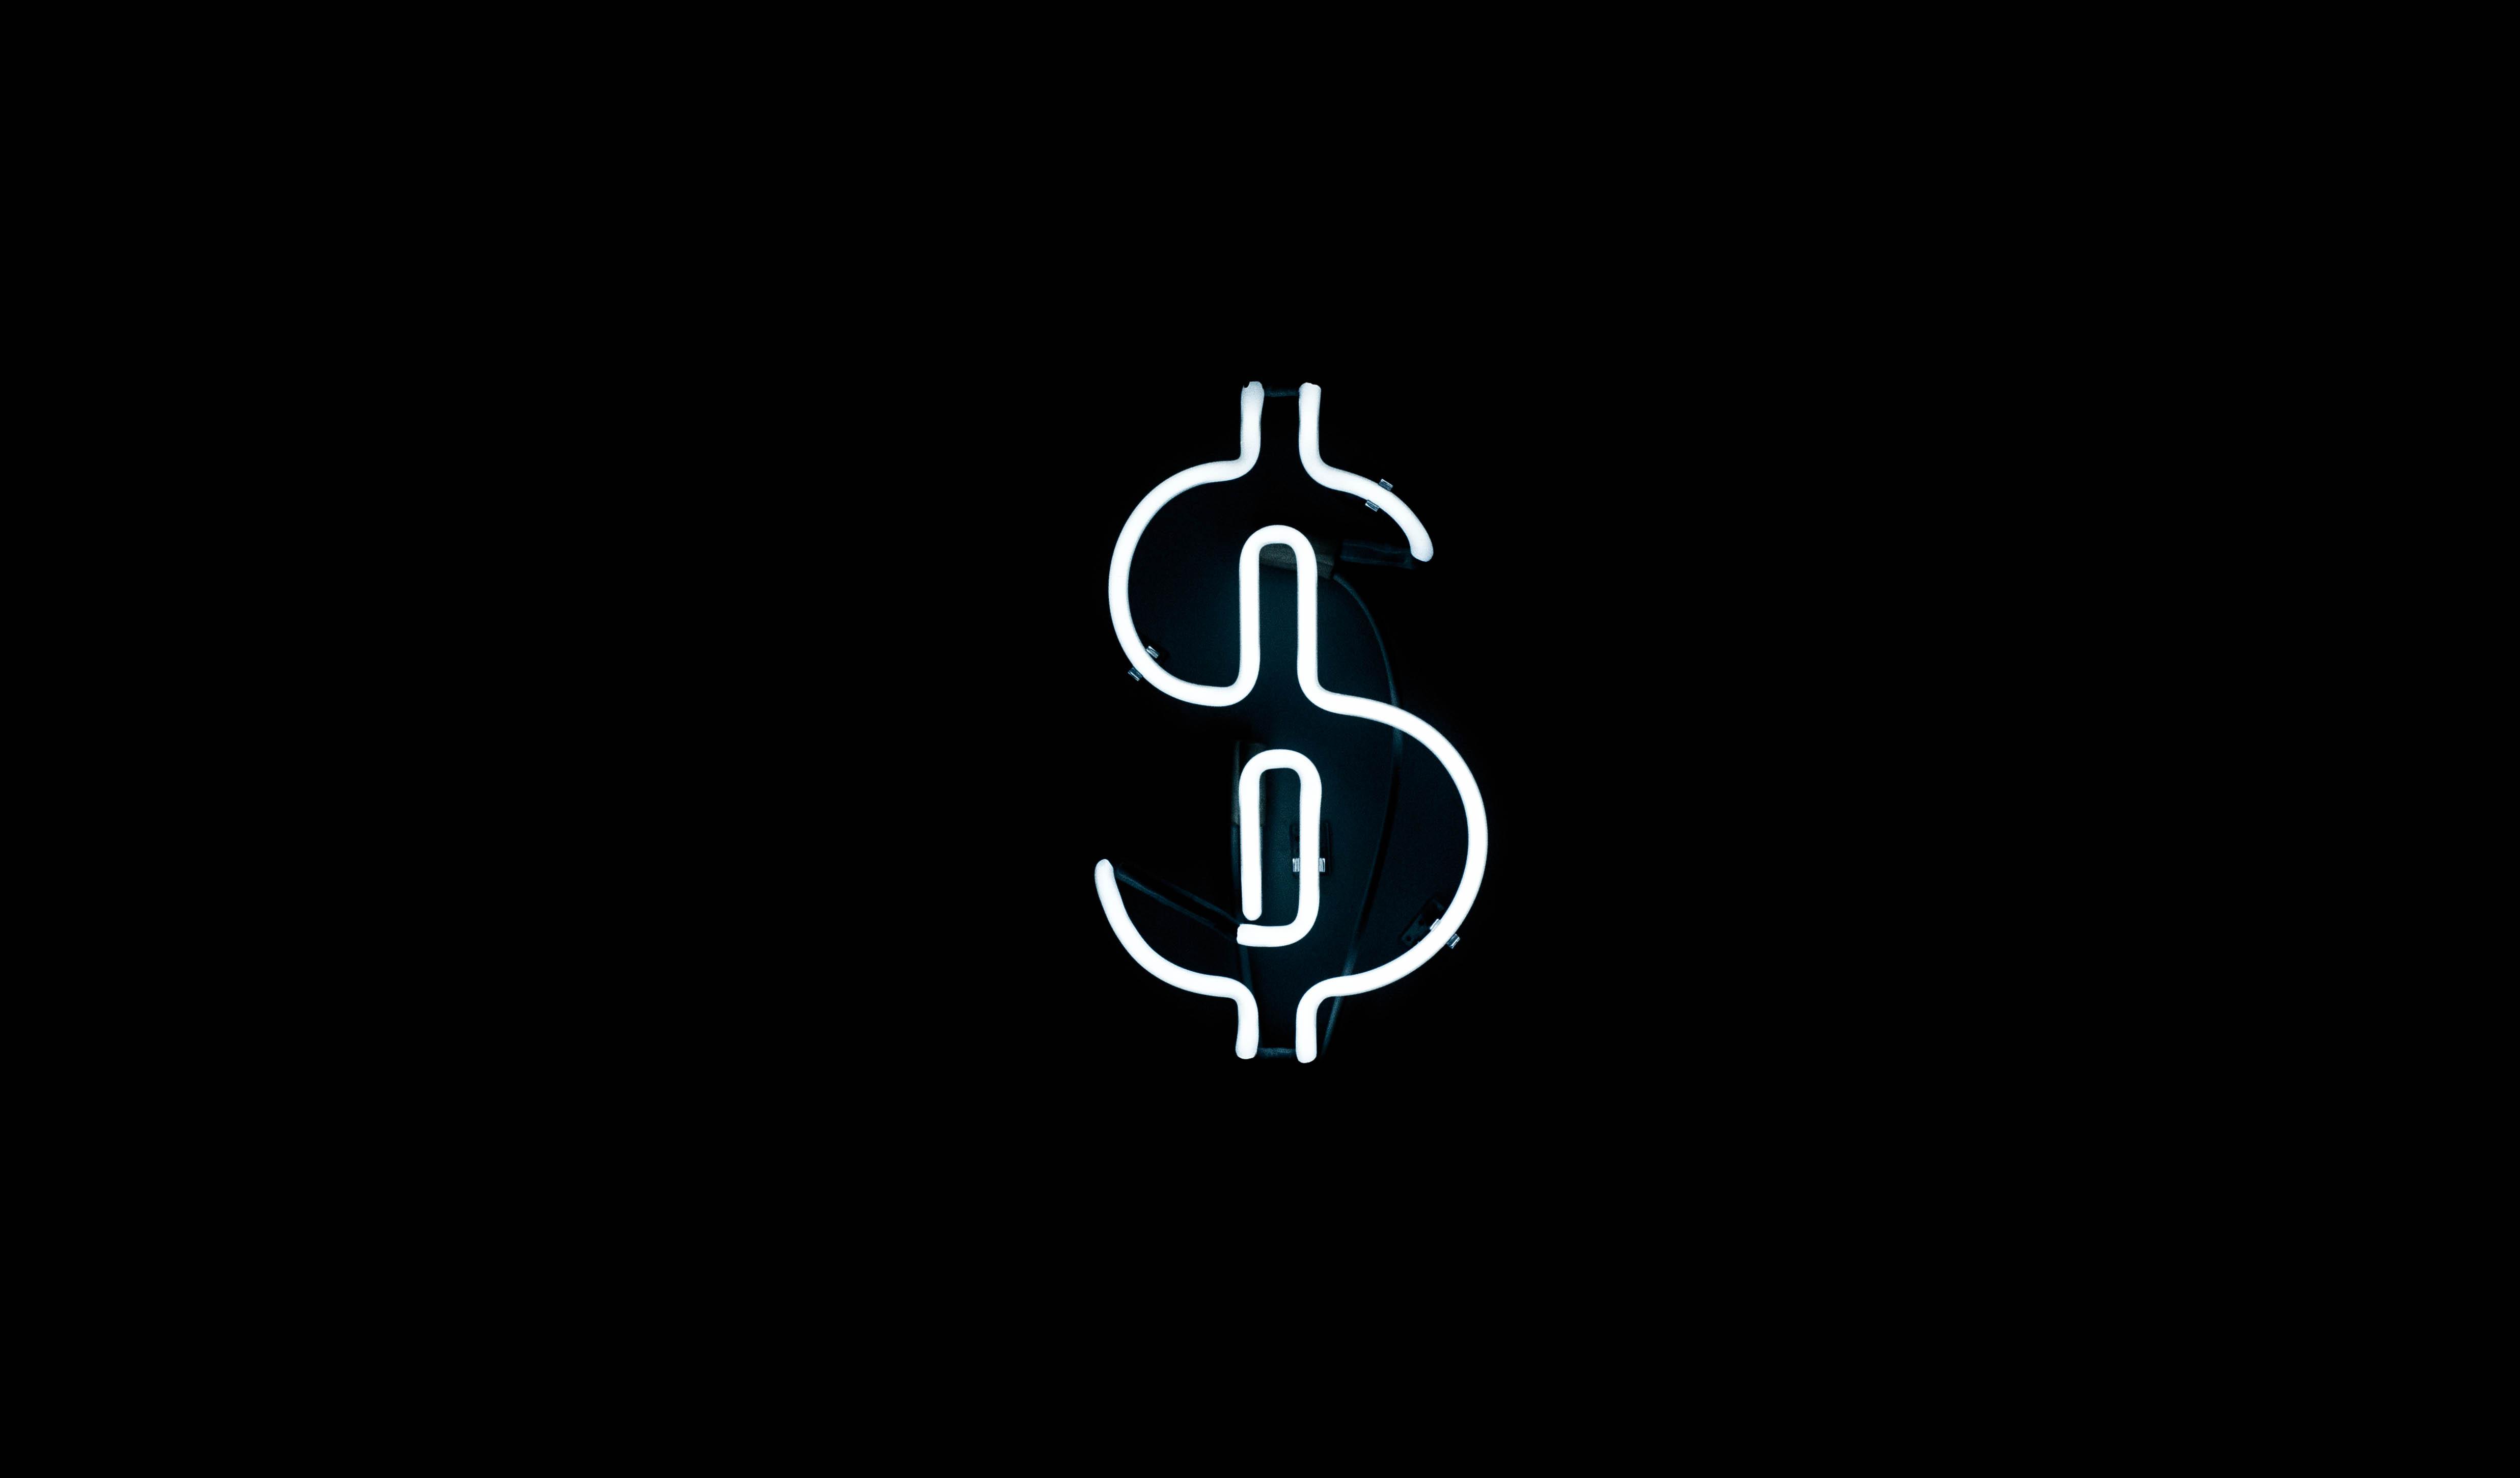 File:Neon Dollar Sign (Unsplash) jpg - Wikimedia Commons